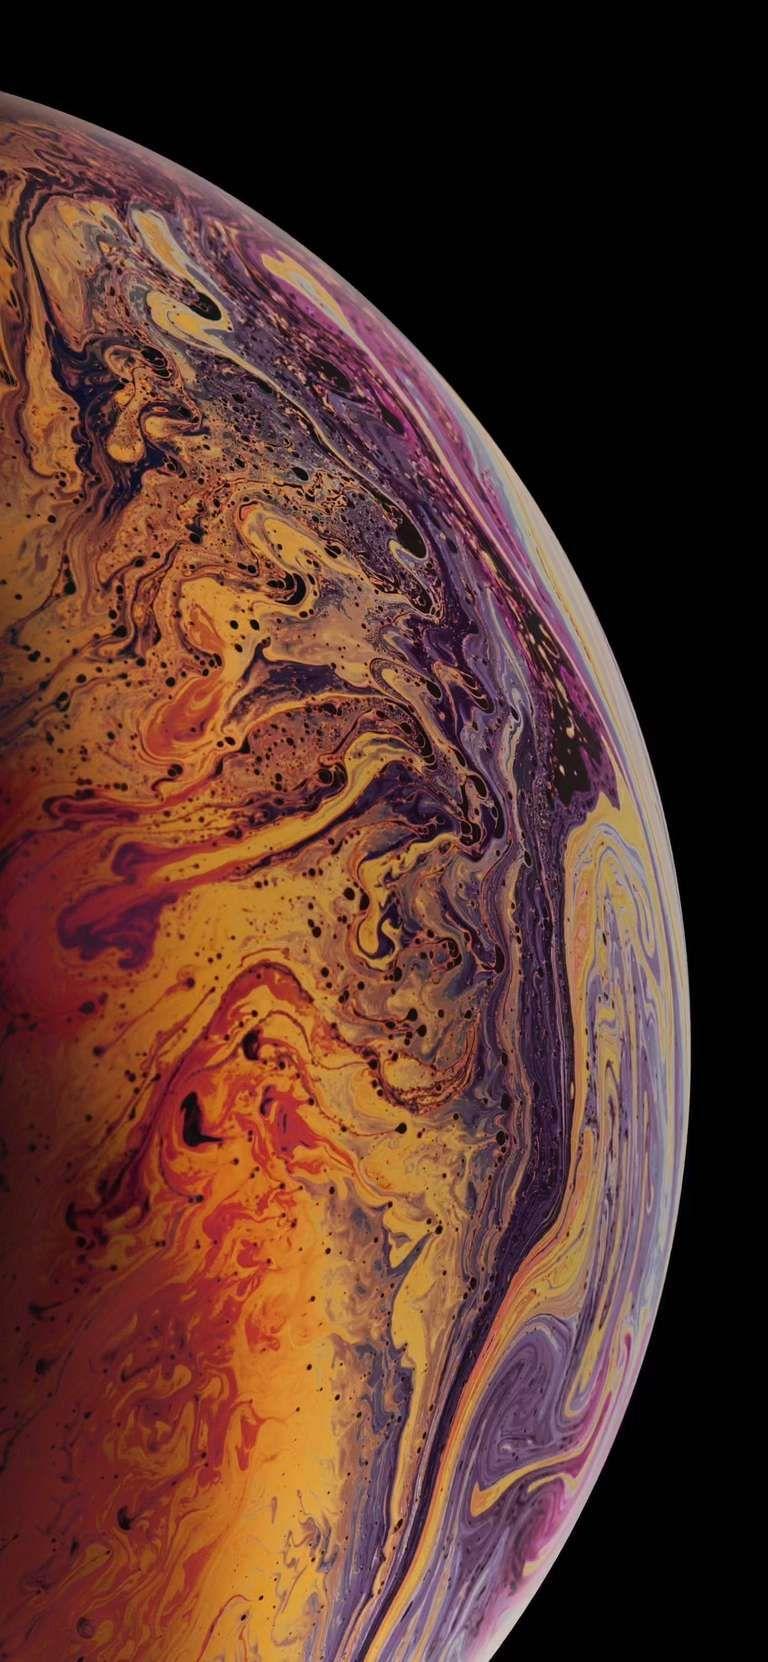 Pin On Iphone Wallpaper Earth Ios iphone earth wallpaper hd 1080p